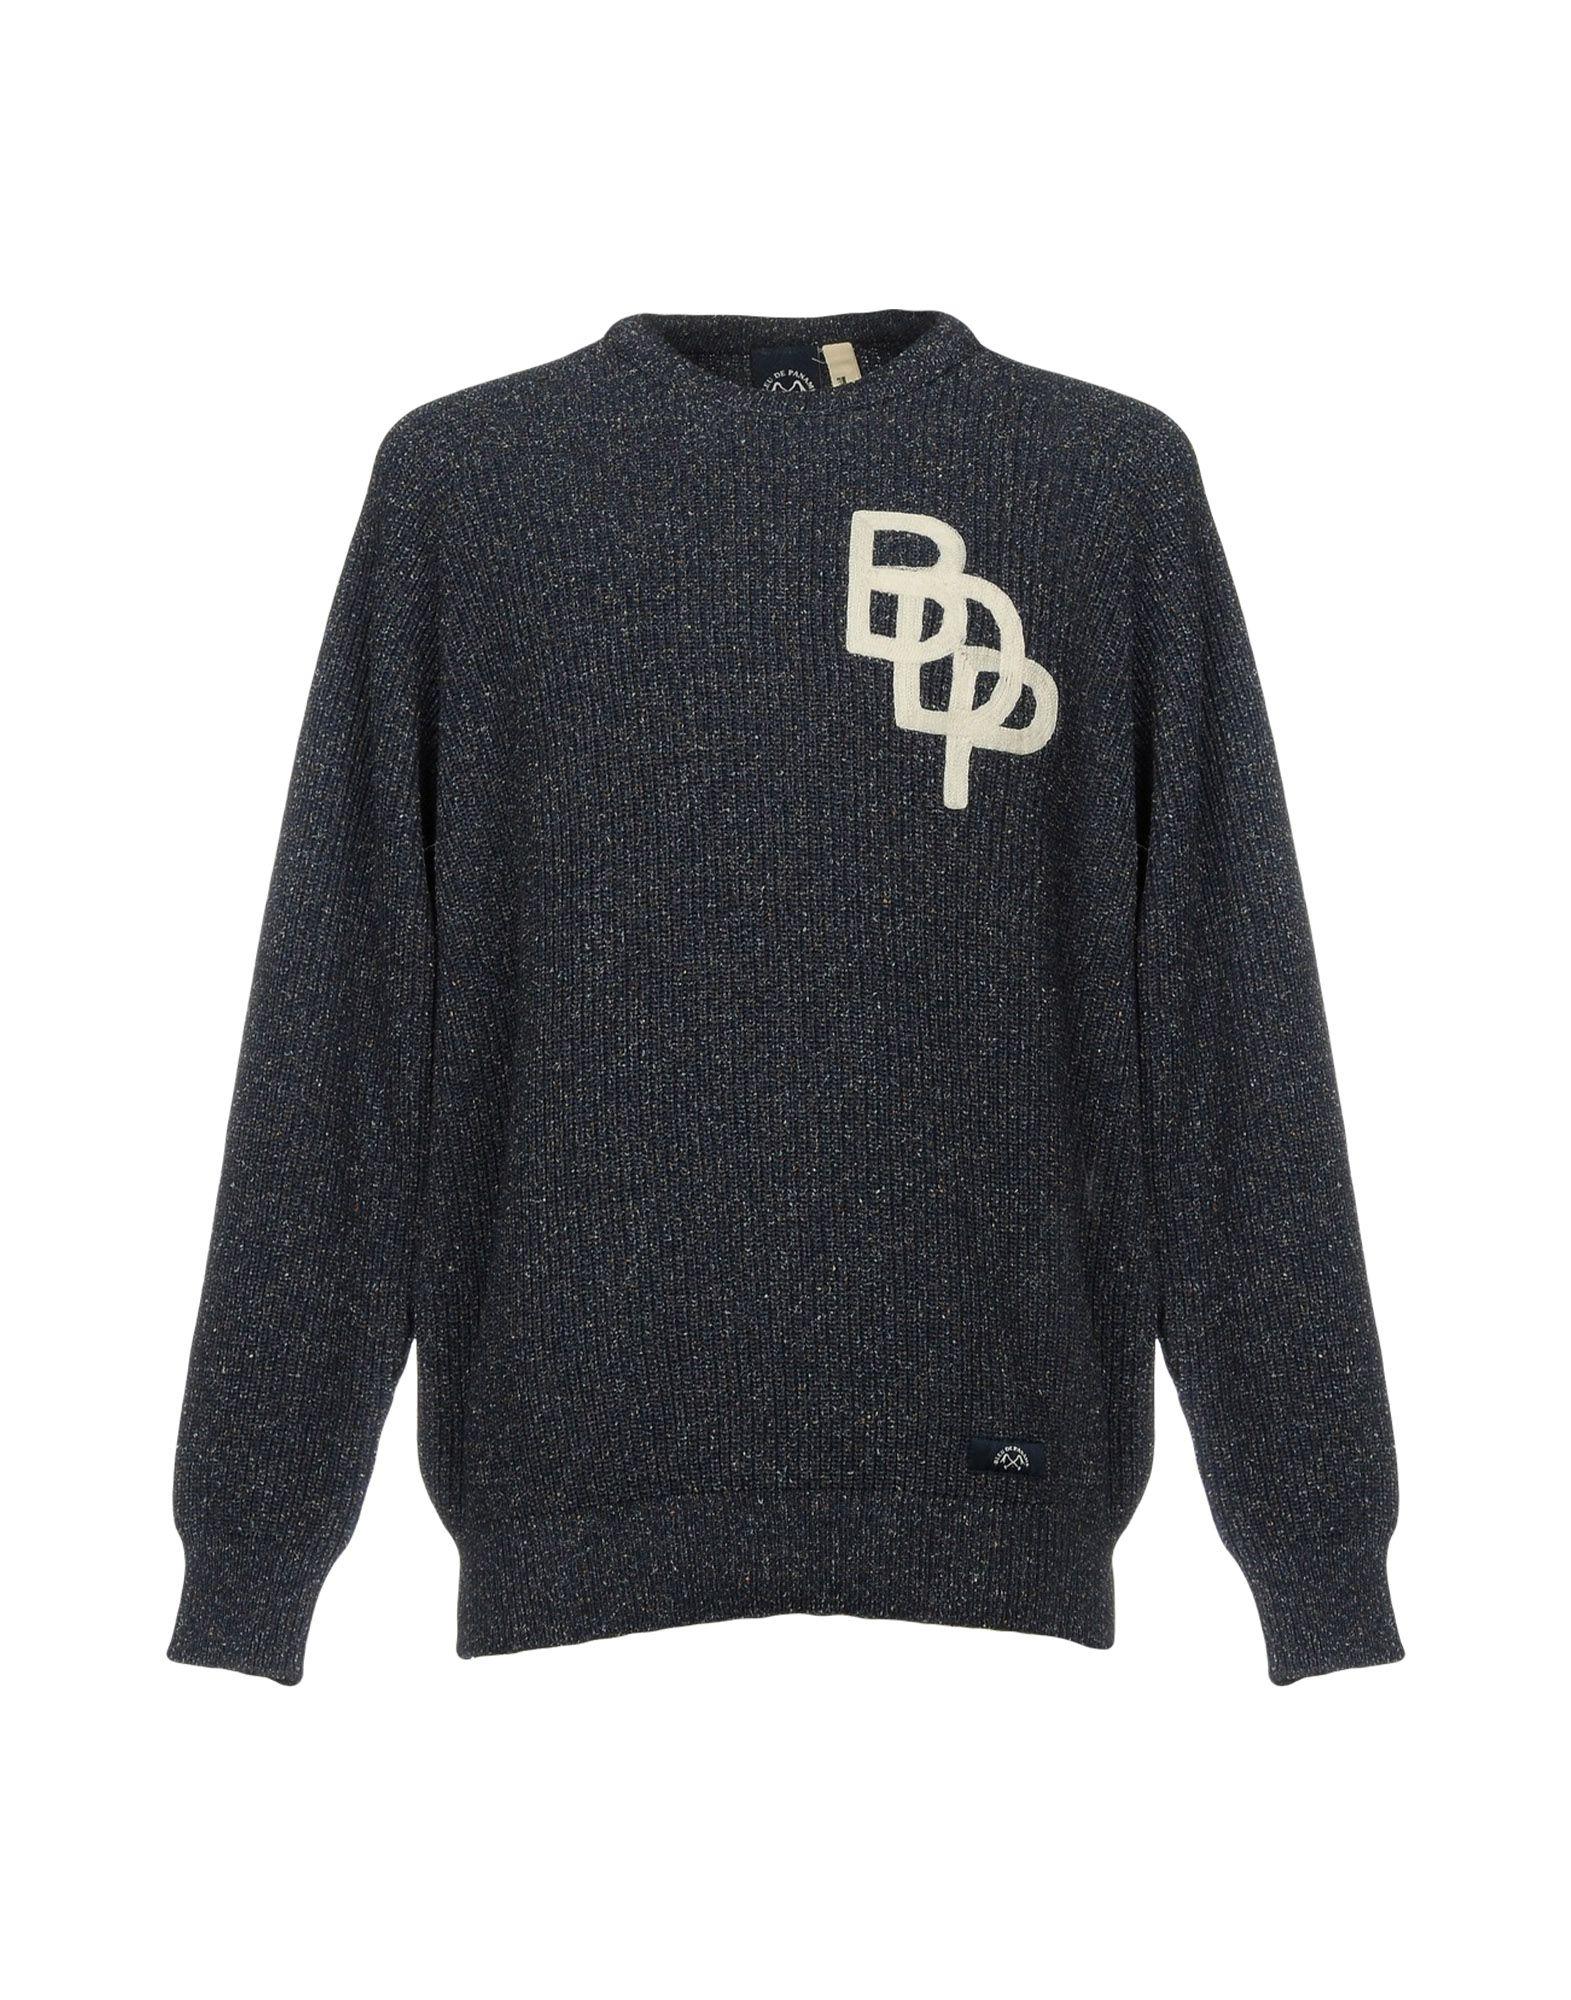 Pullover Bleu De Paname Donna - Acquista online su